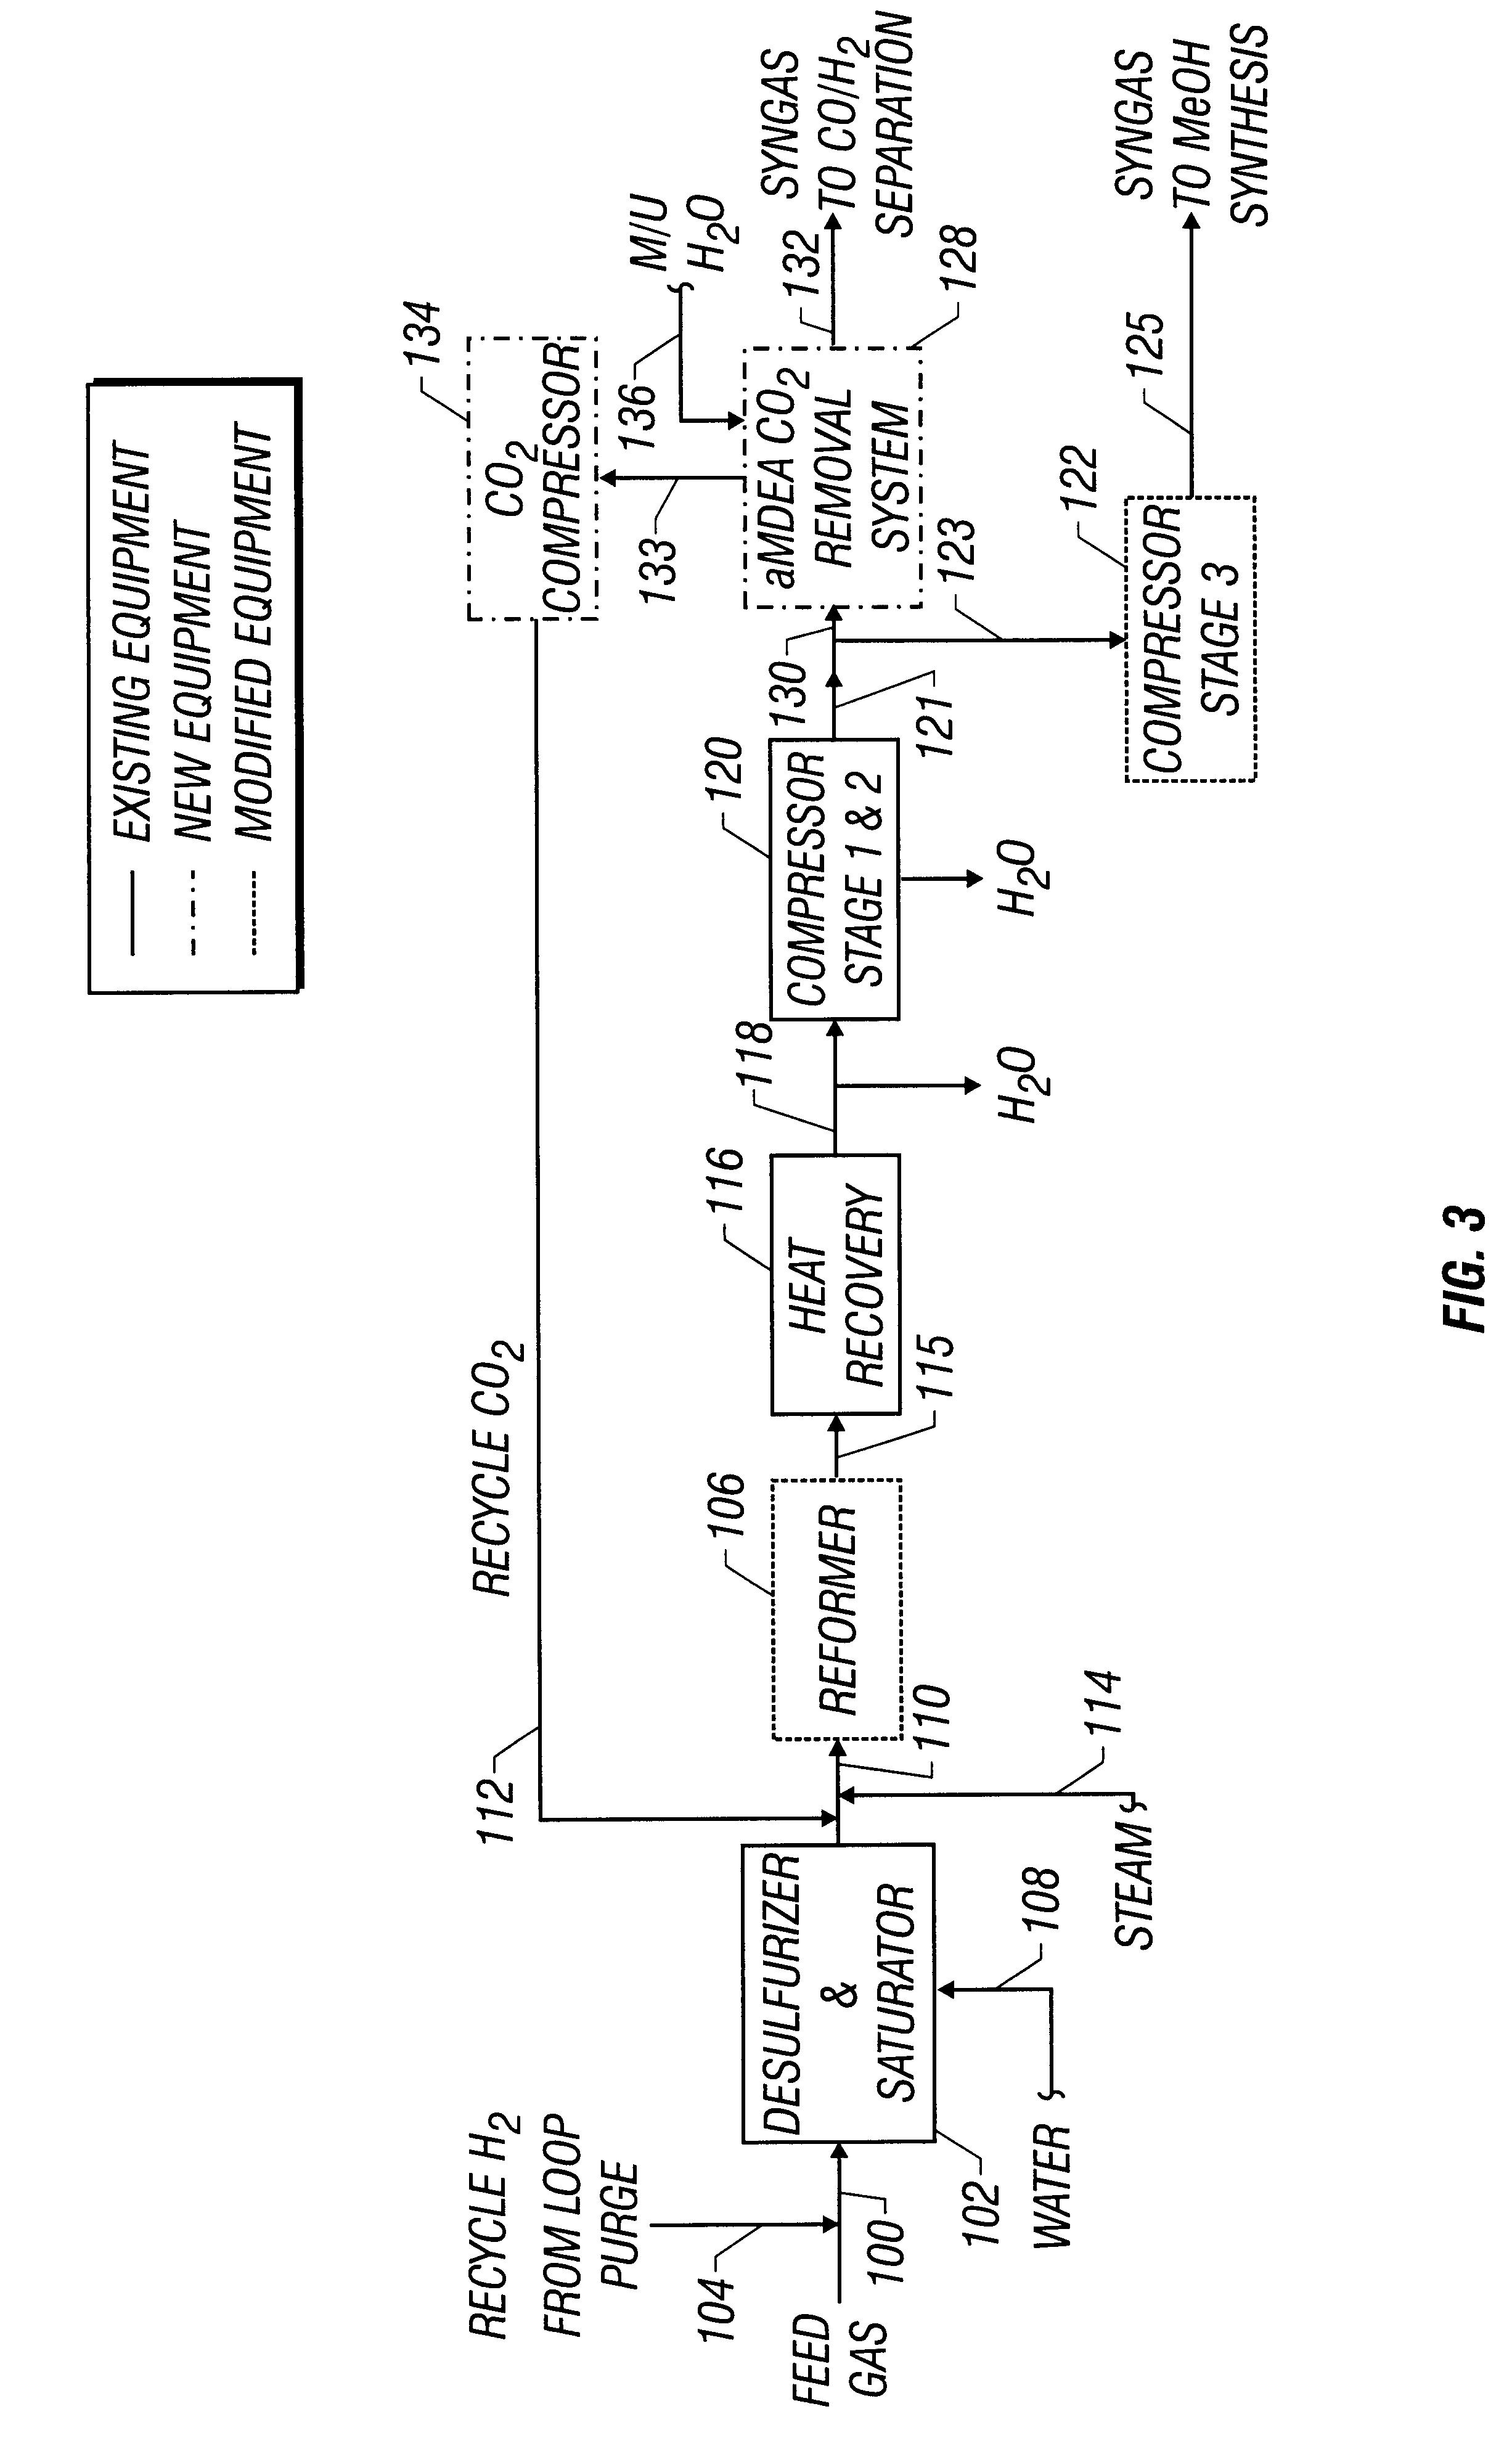 Patent Us6274096 Methanol Plant Retrofit Google Patents